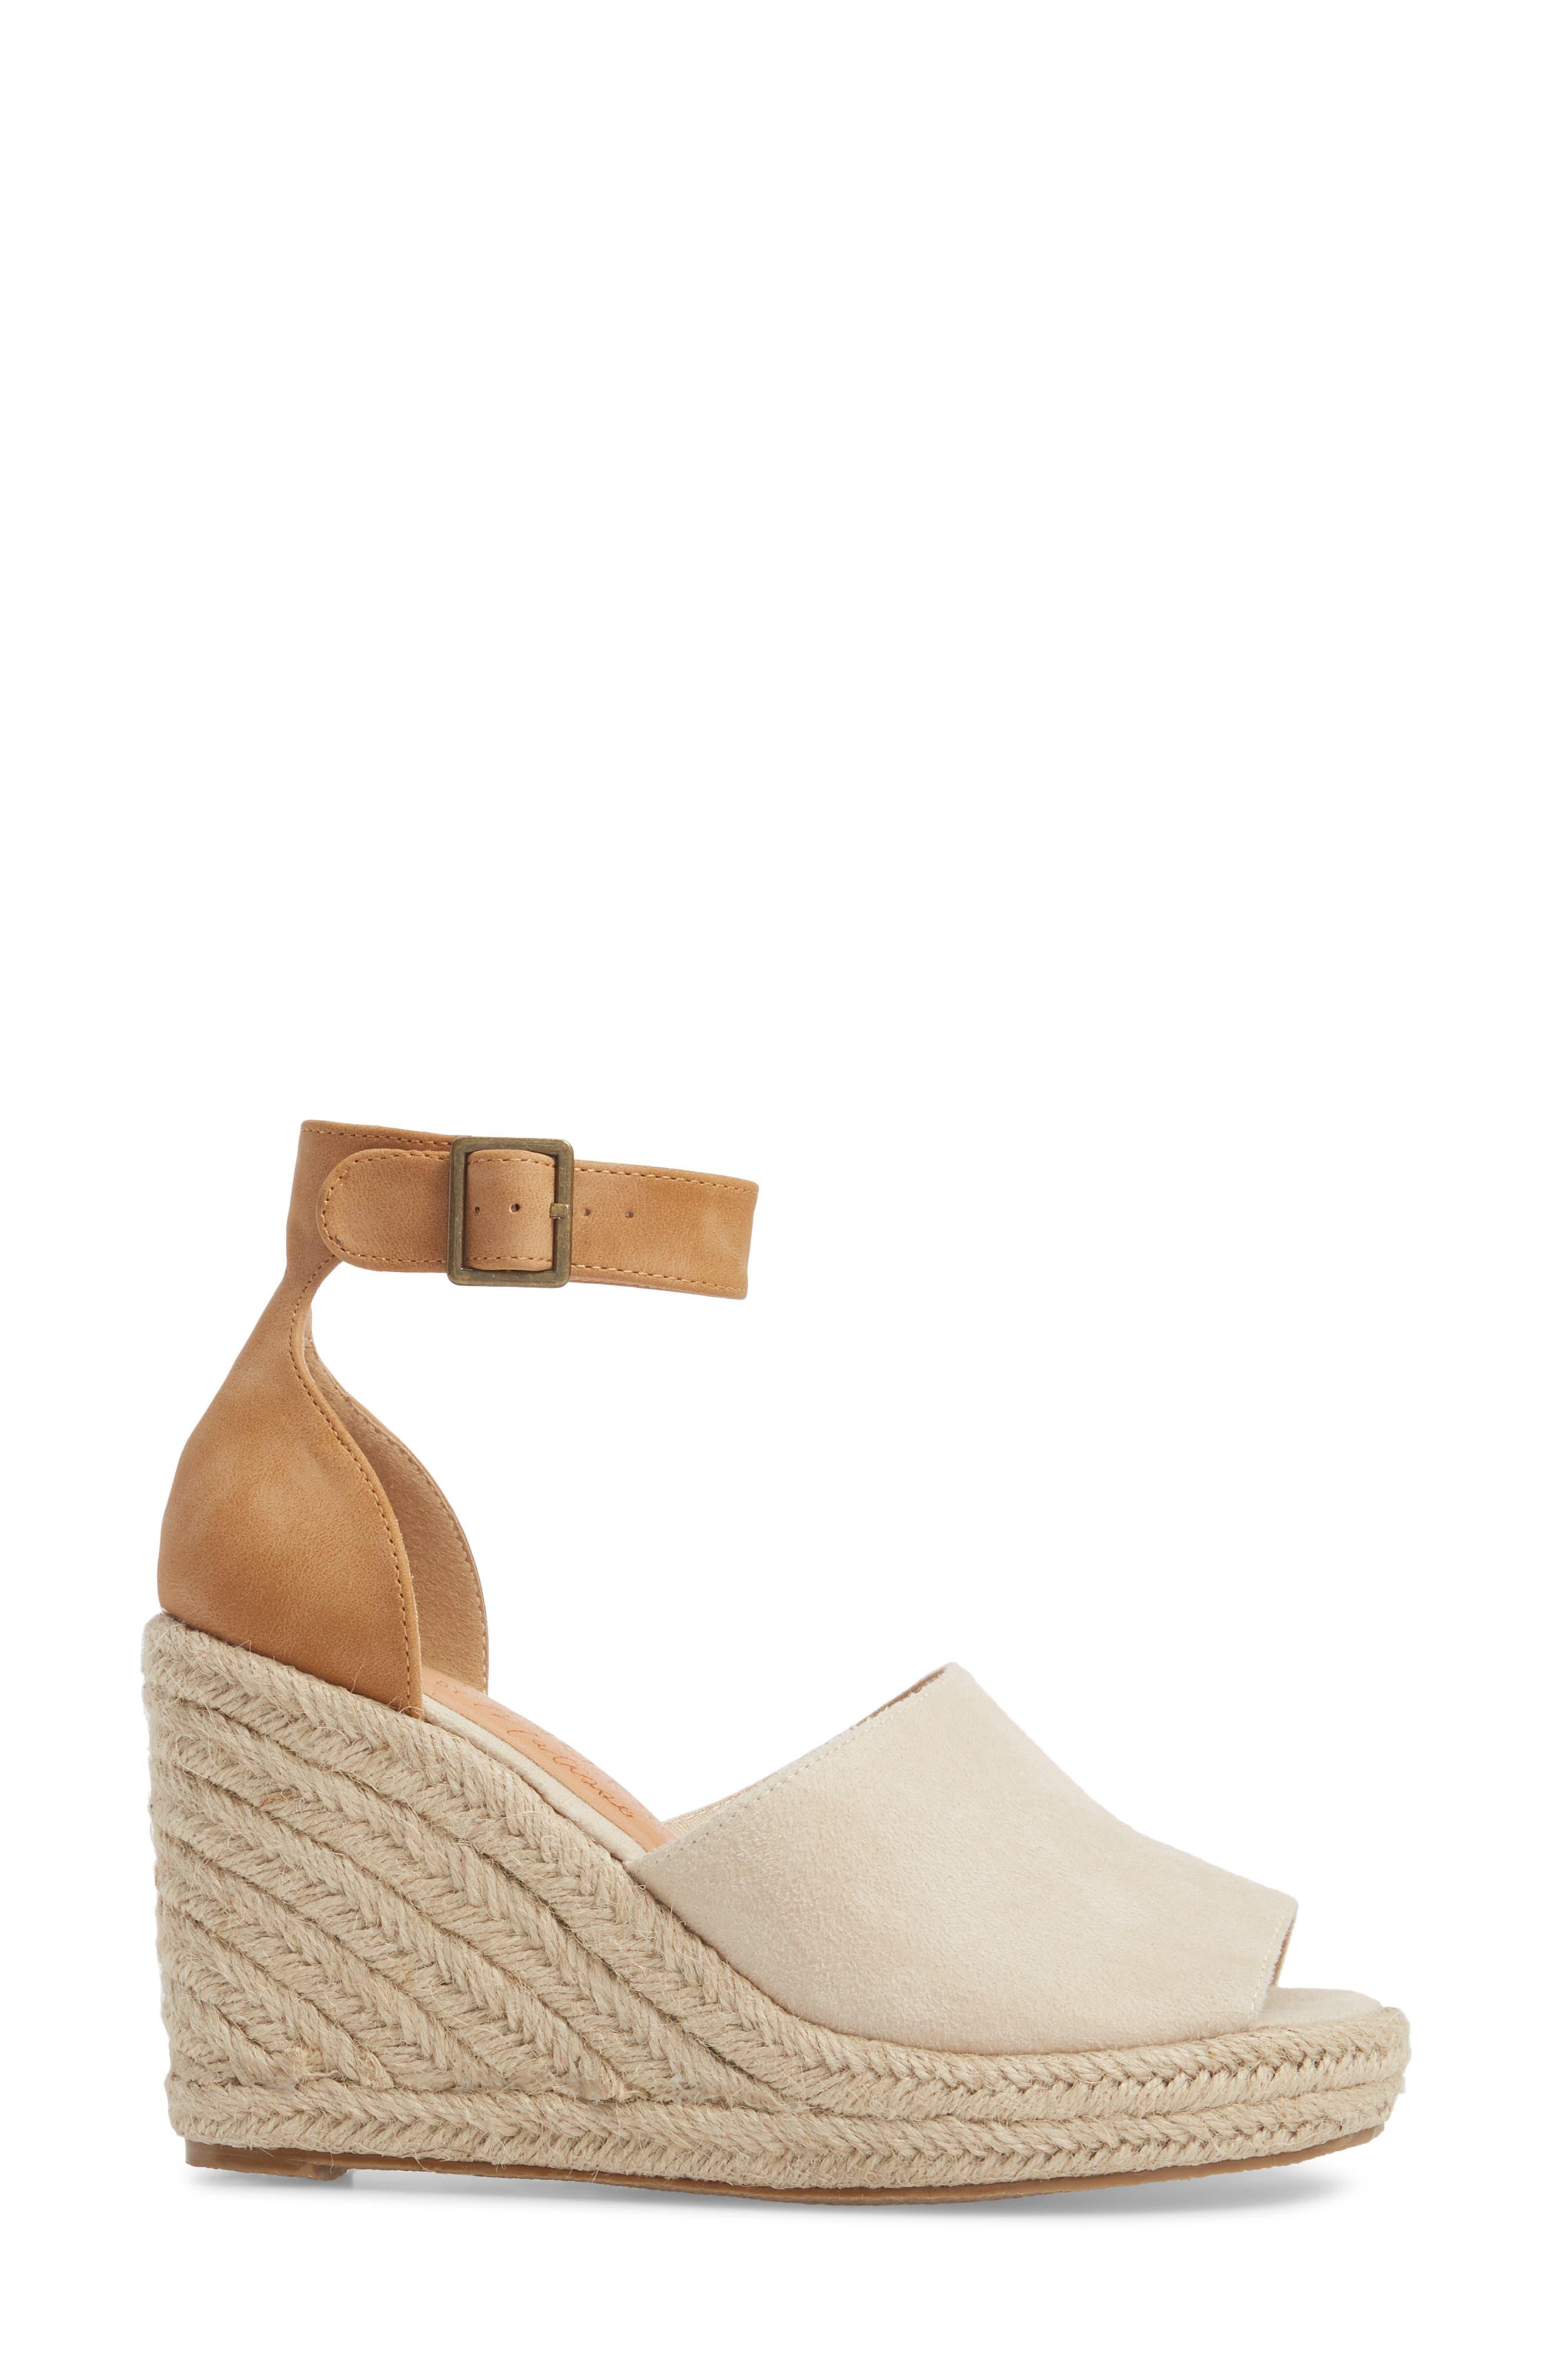 Flamingo Wedge Sandal,                             Alternate thumbnail 3, color,                             Natural Suede